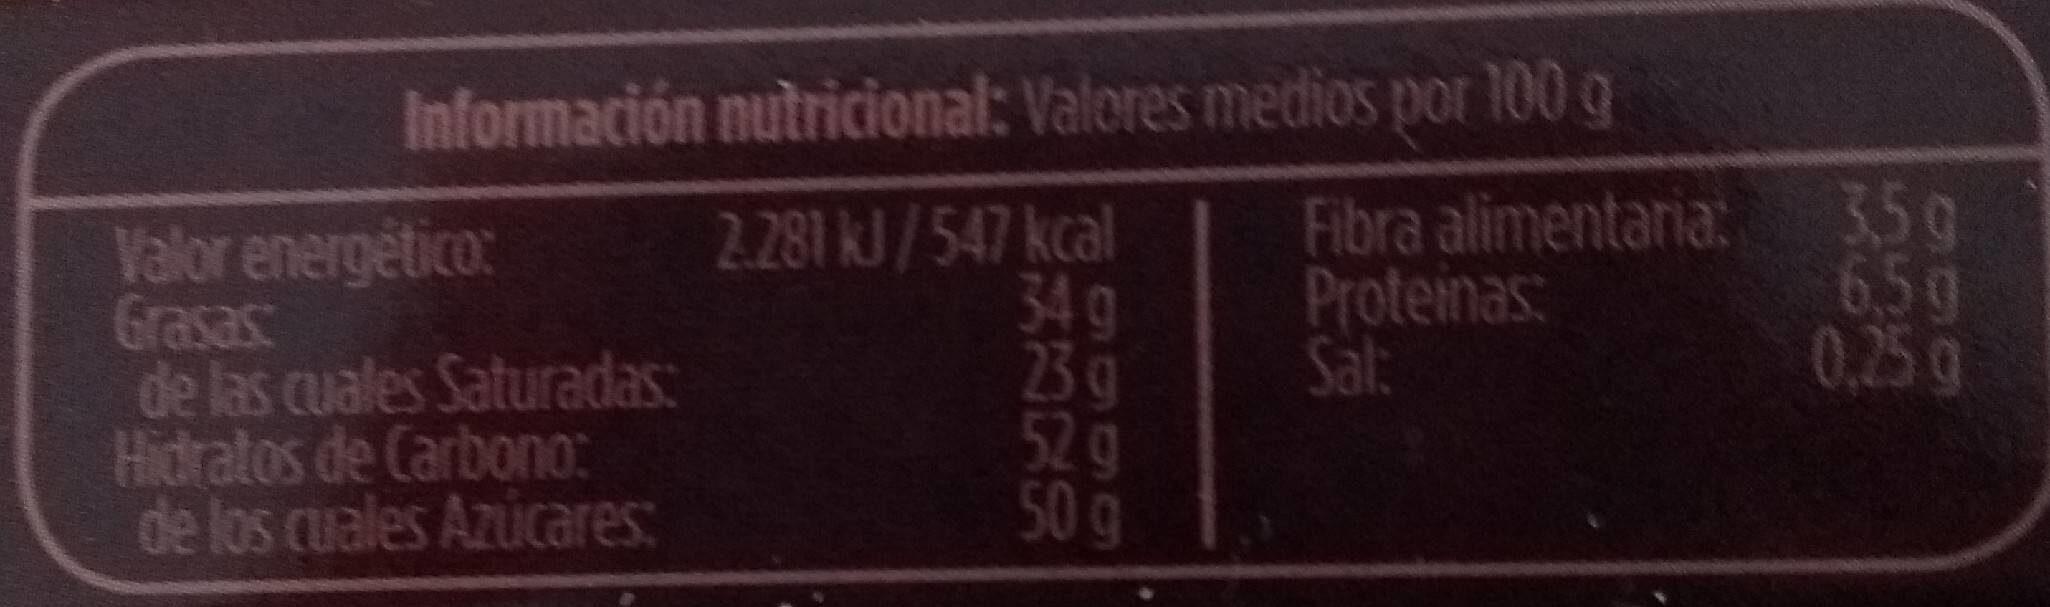 Turrón tres chocolates - Nutrition facts